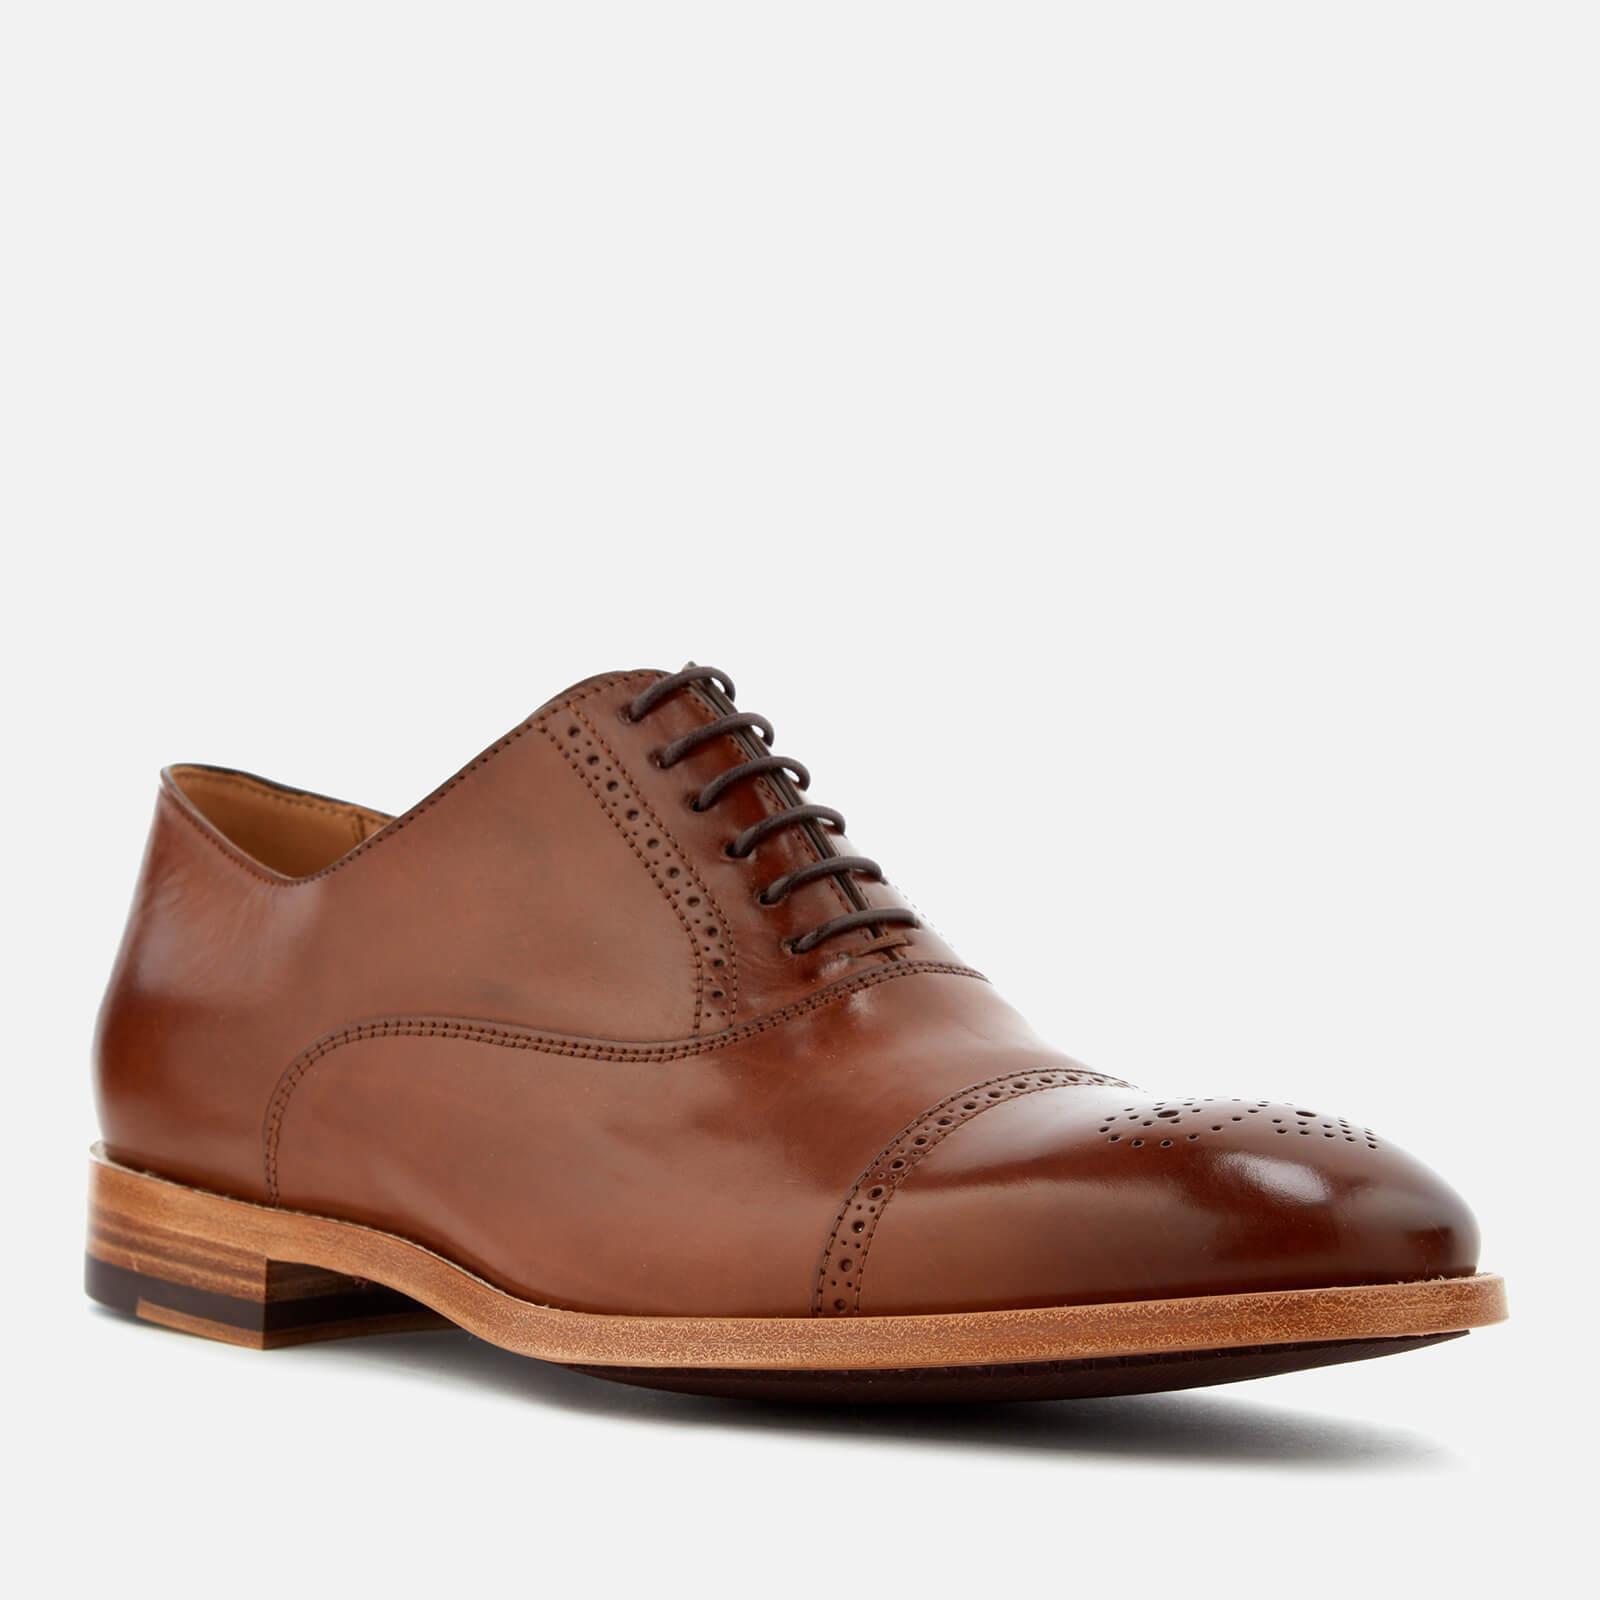 NW PAUL SMITH oxford scarpe Marronee BERTIN V016 BCA Leather Brogue Toe Oxford